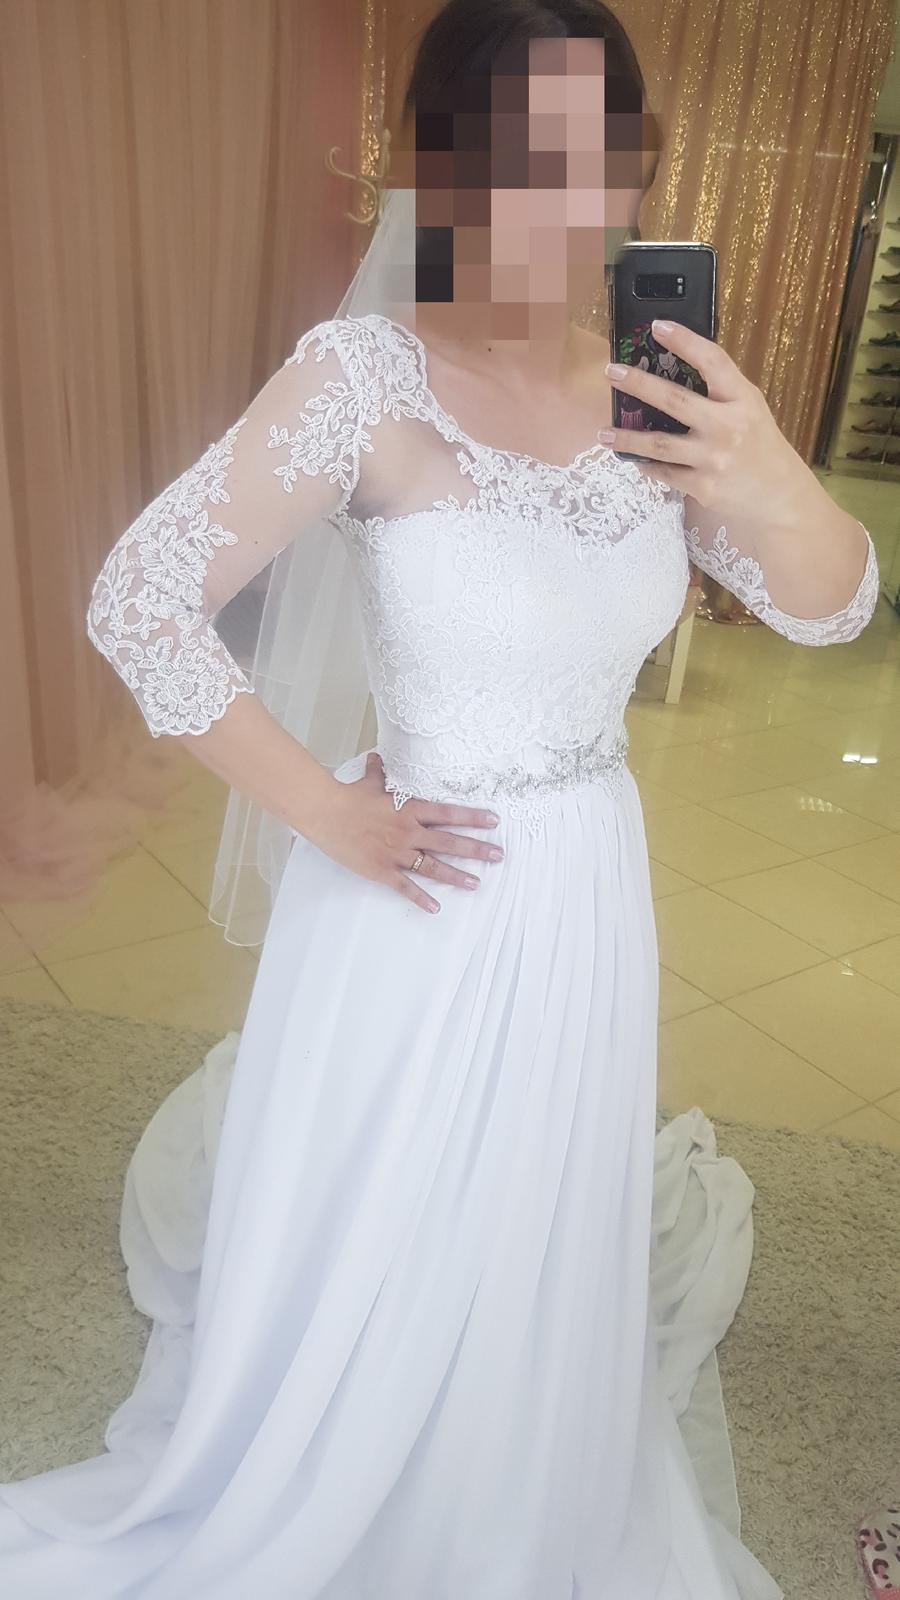 Jemné svadobné šaty- nové nenosené - Obrázok č. 1